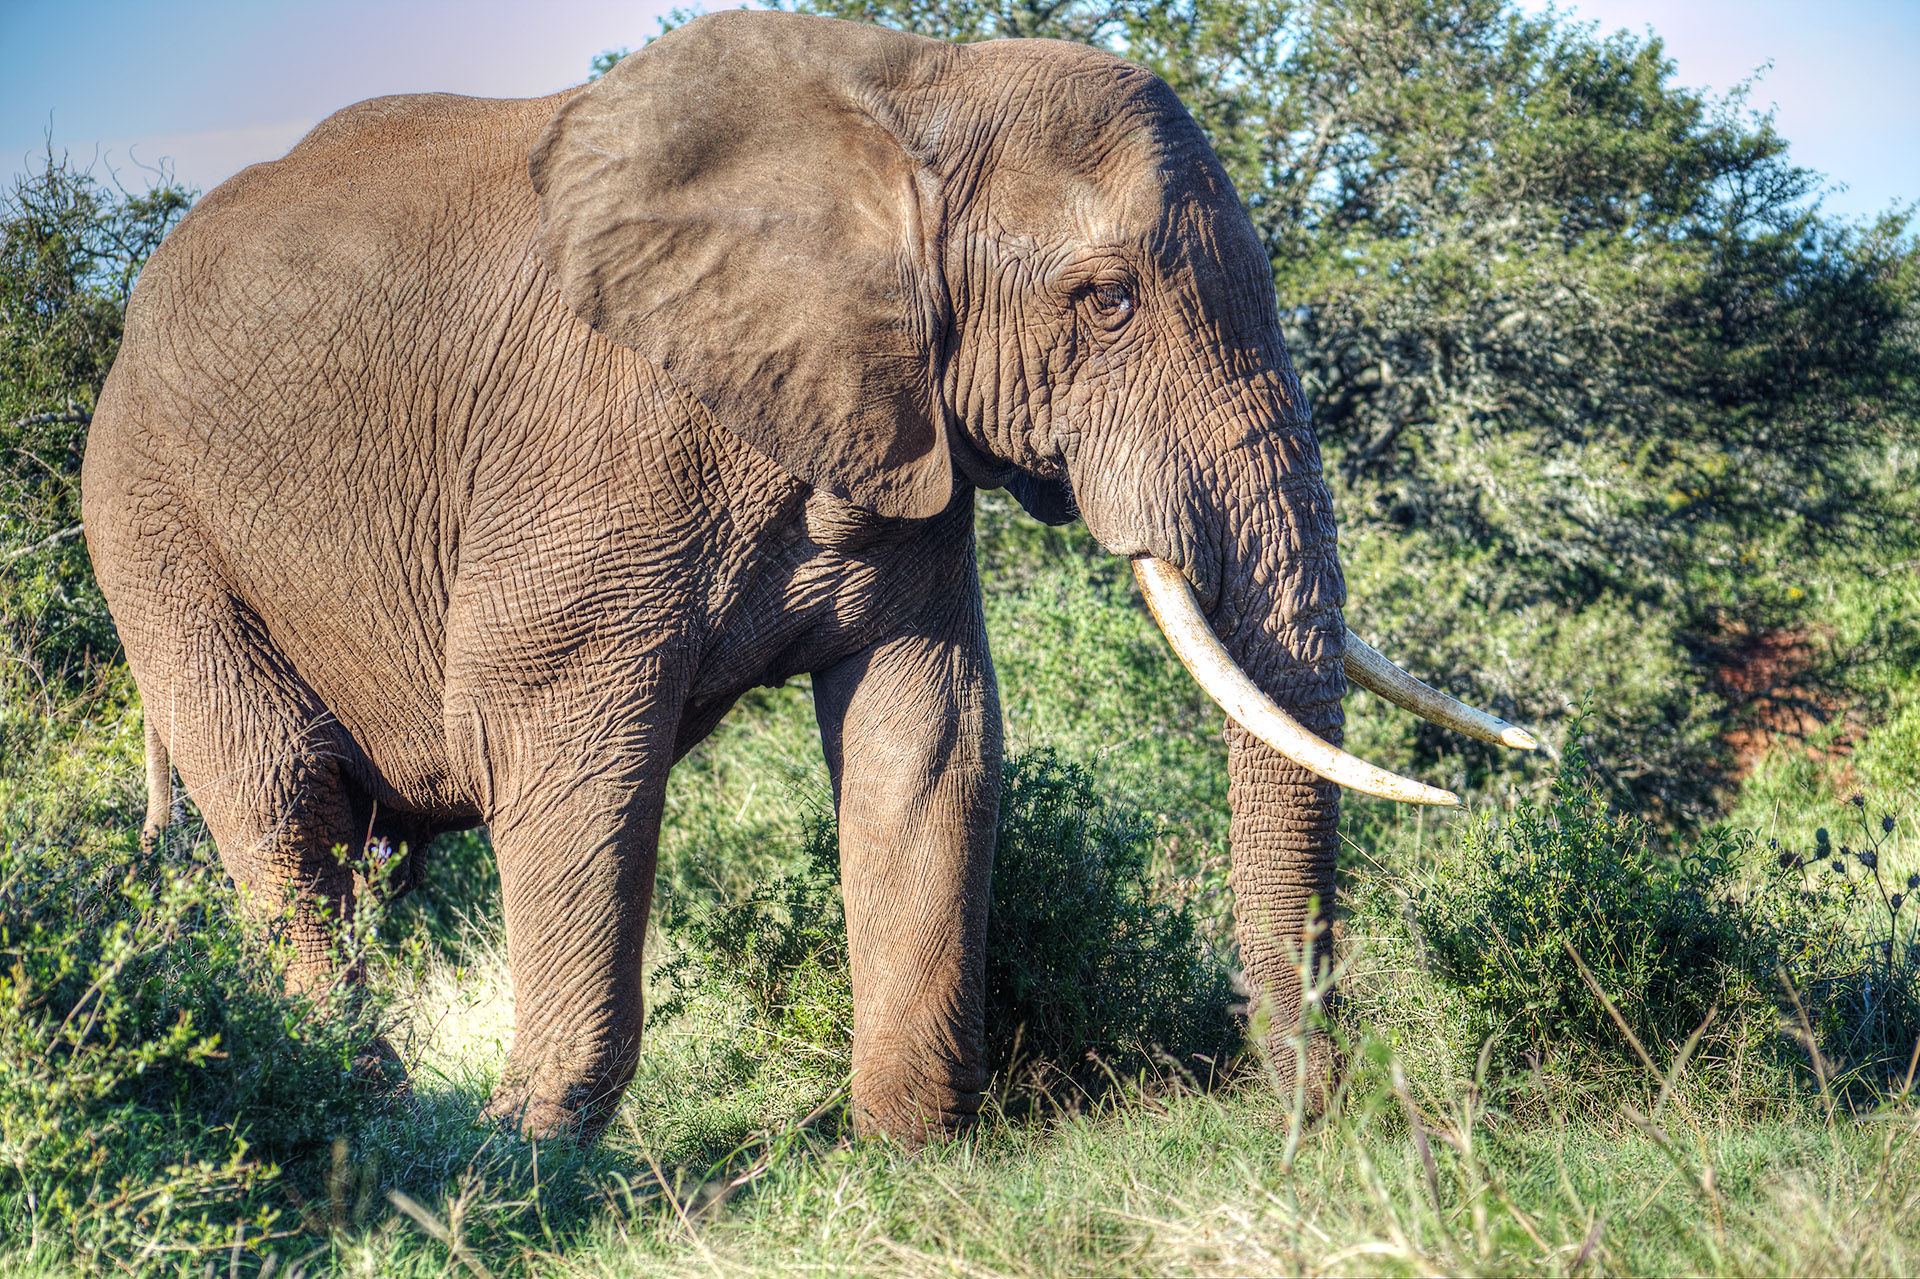 A majestic elephant.